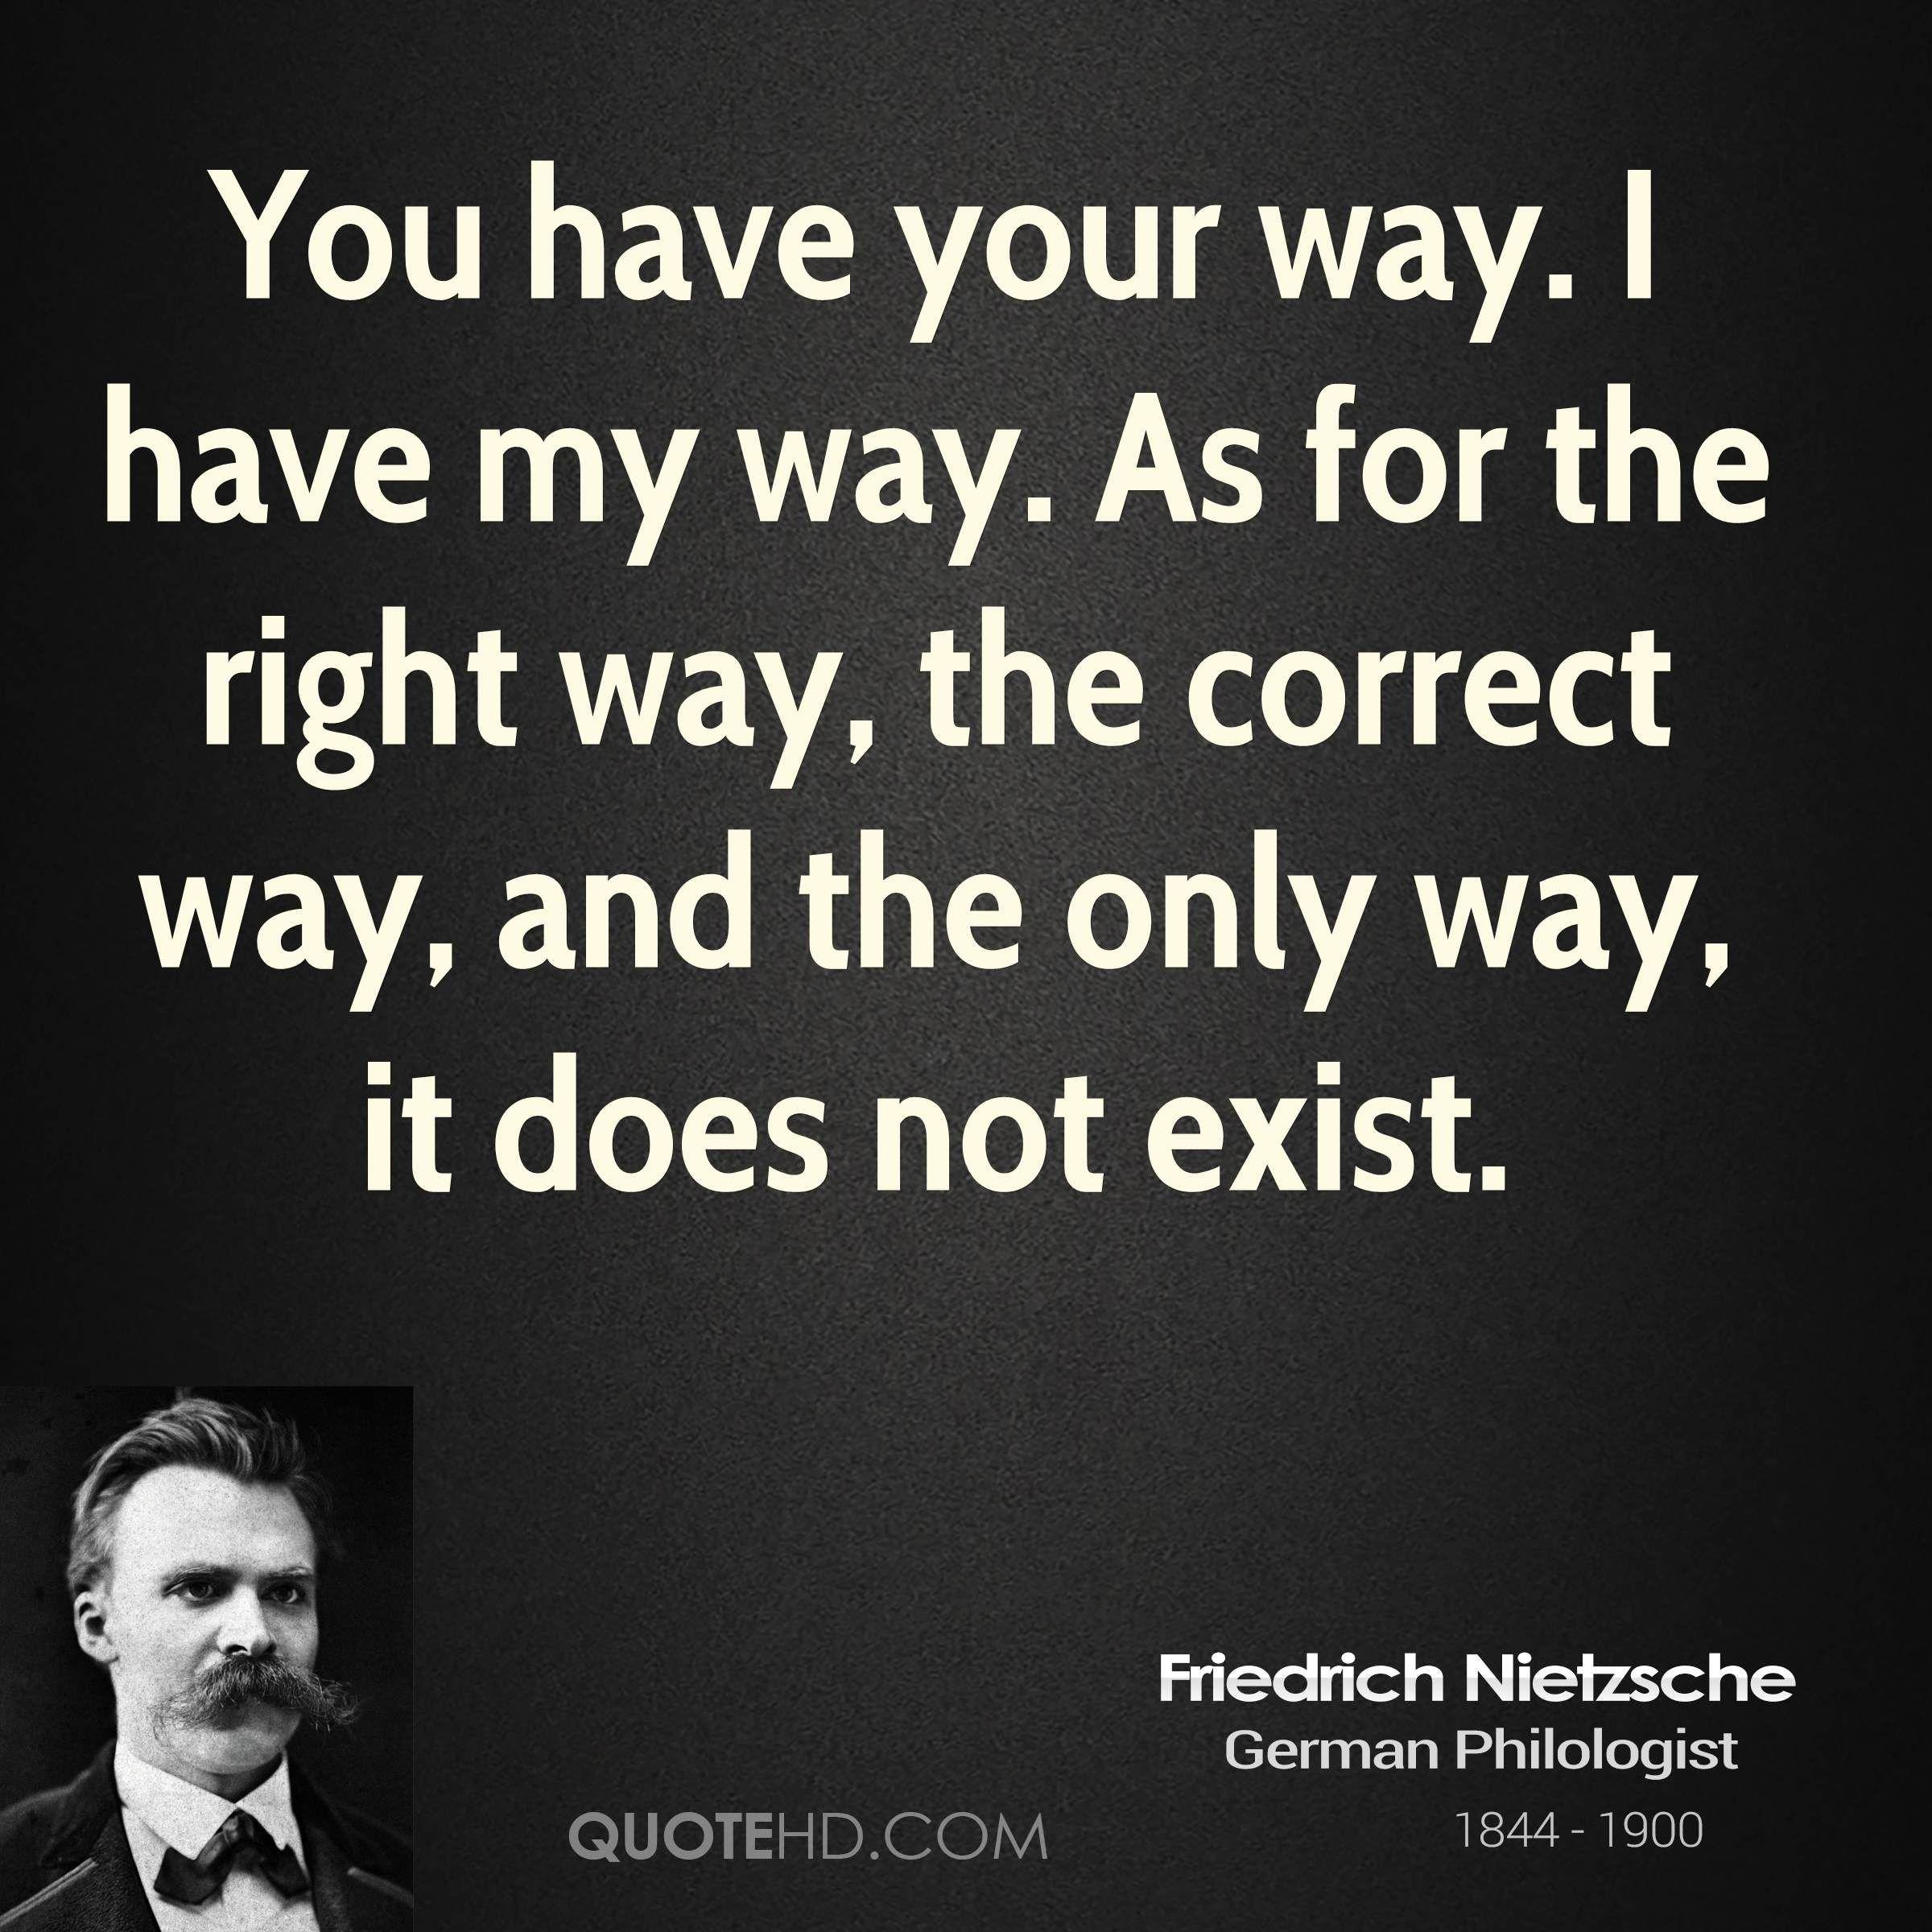 Nietzsche Quotes Nietzsche Quotes  Friedrich Nietzsche Quotes The Way  Quotes